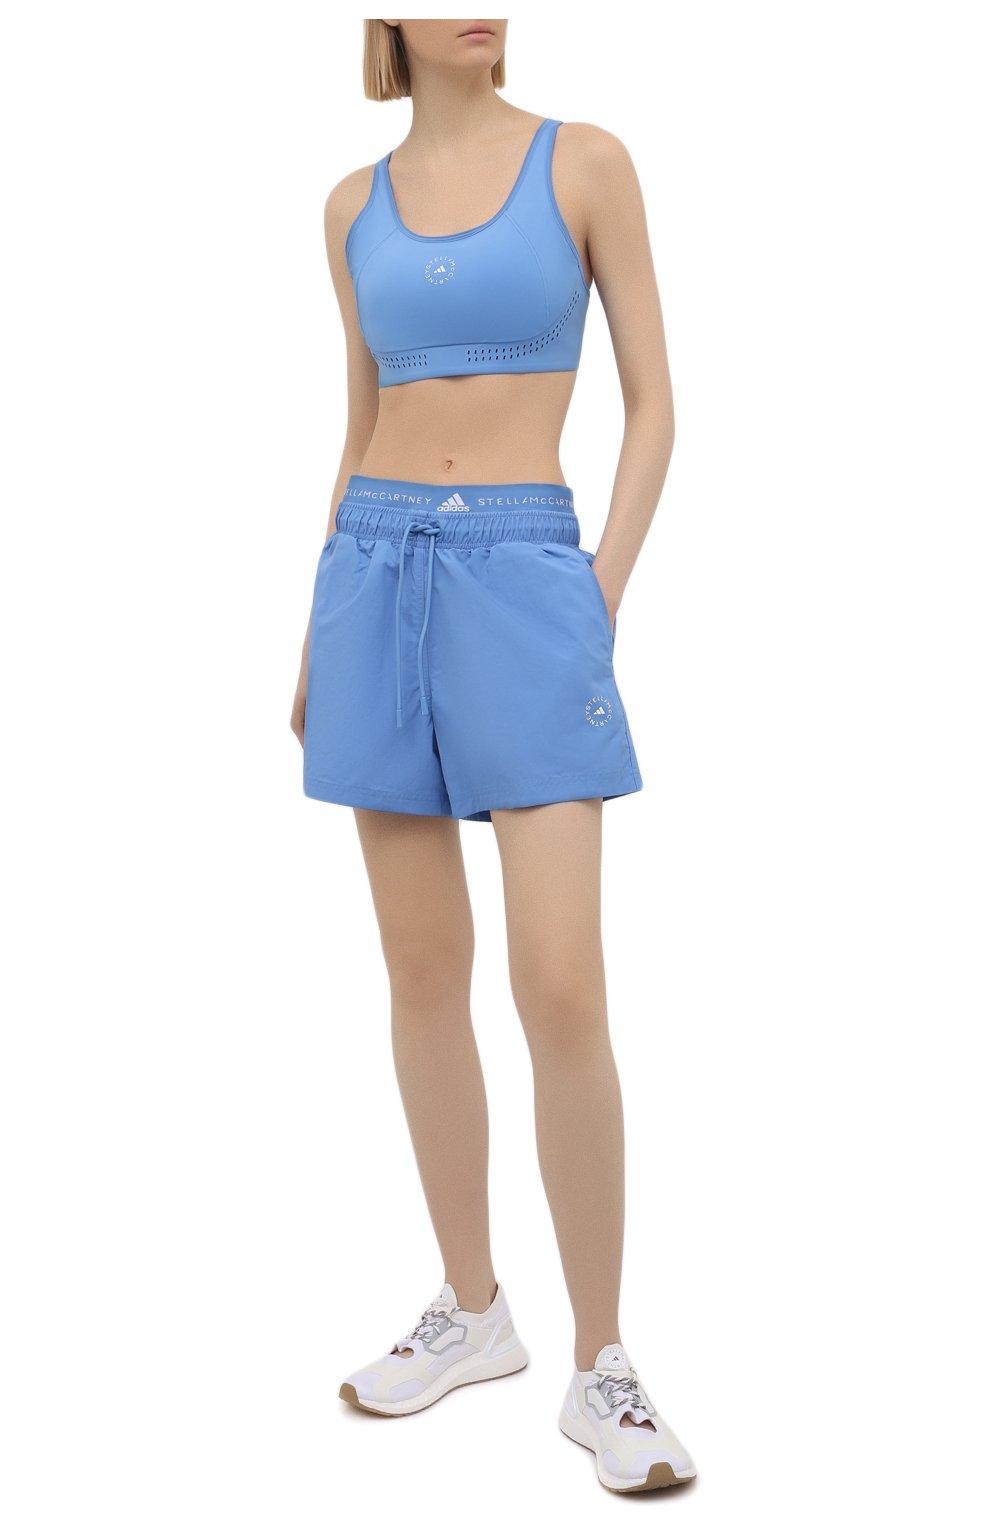 Женский бра-топ ADIDAS BY STELLA MCCARTNEY голубого цвета, арт. GQ1214 | Фото 2